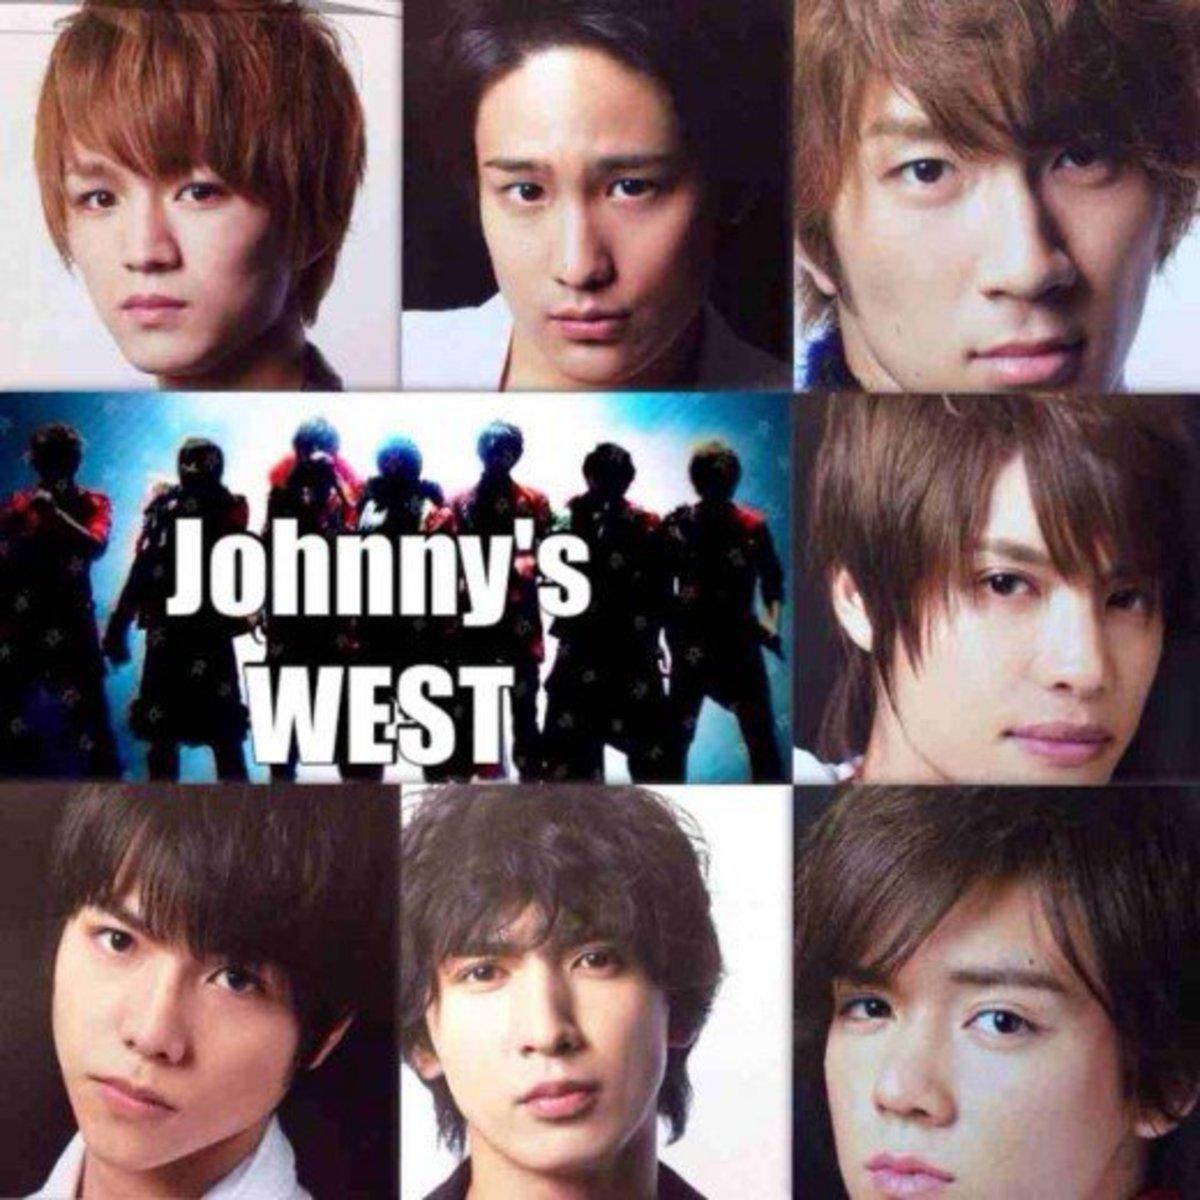 Johnny's West